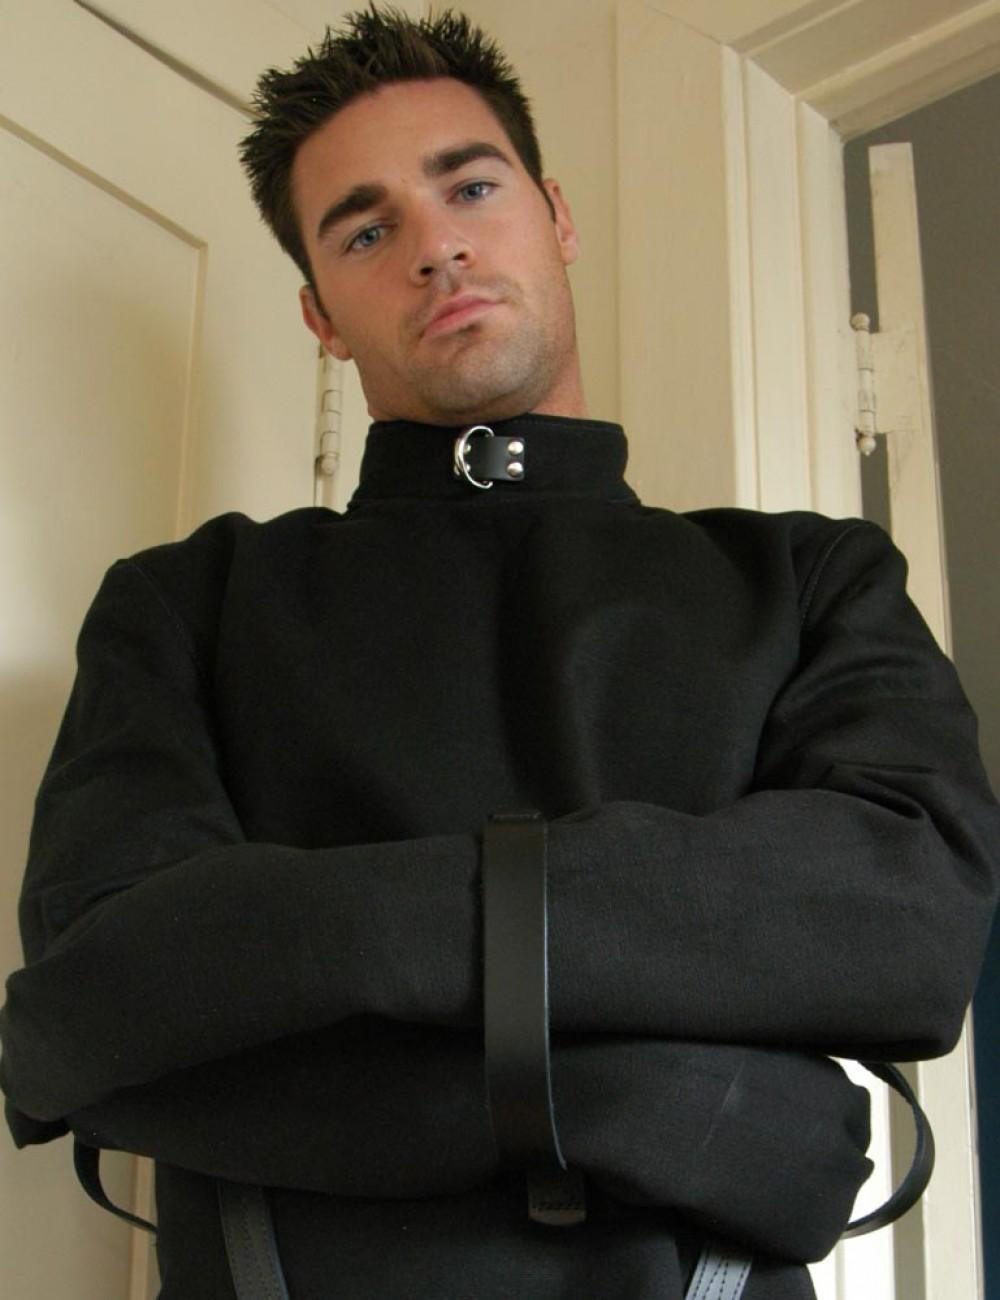 Black Canvas Straitjacket w/ Leather Straps